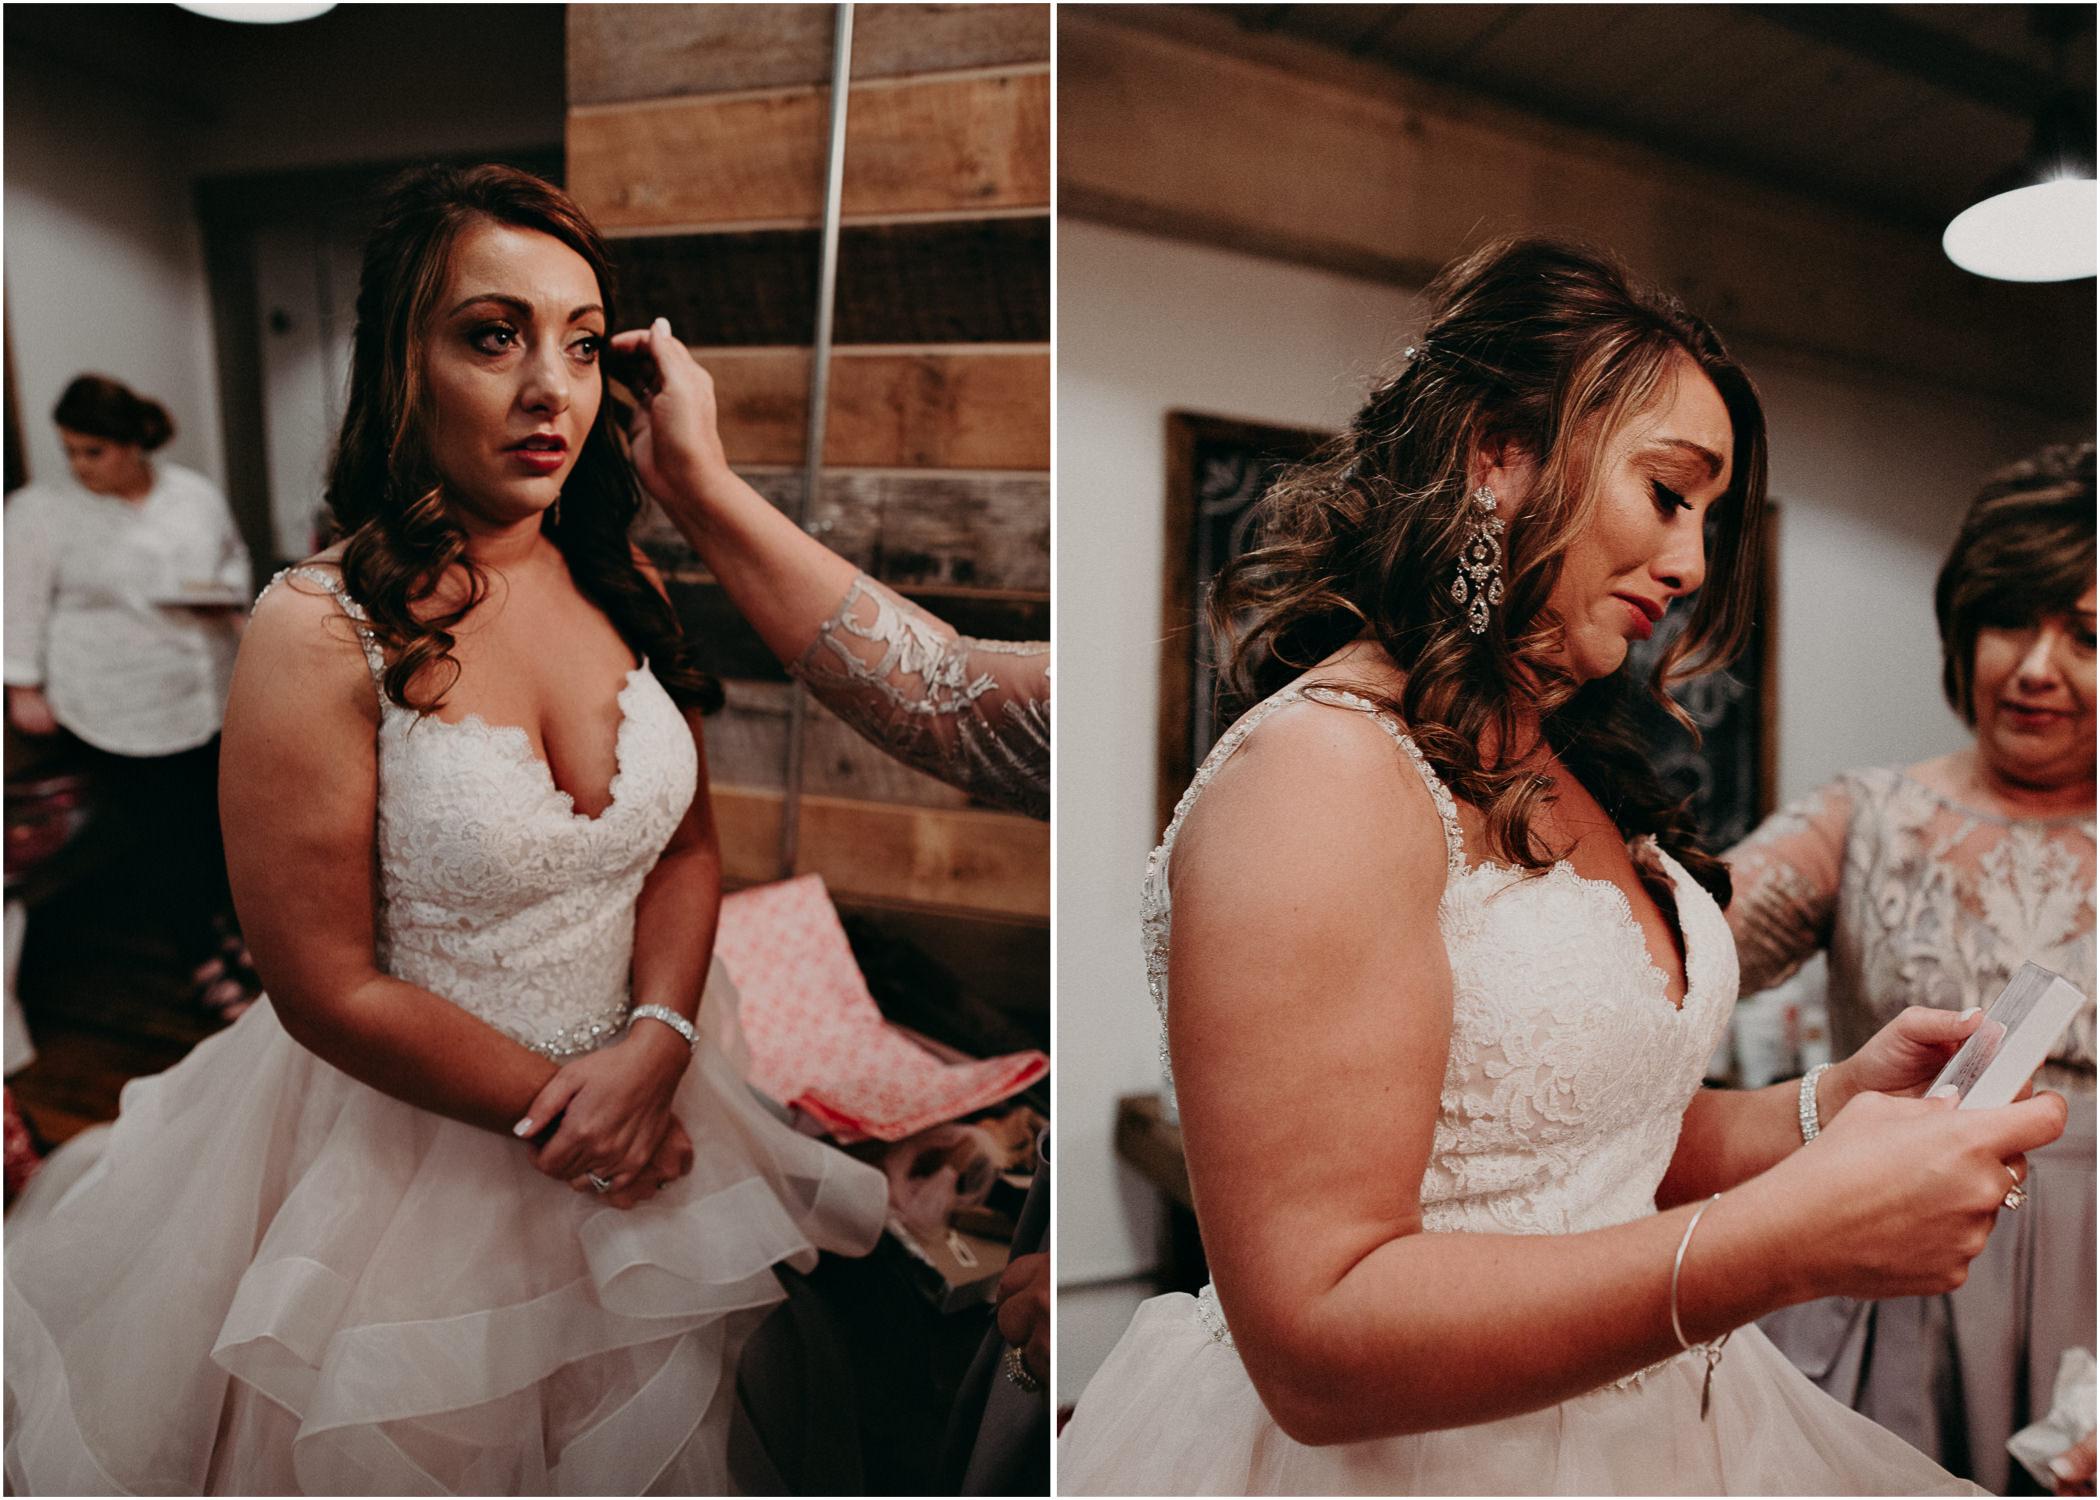 14 4 - Atlanta Wedding Photographer - The engine room - Ga - Wedding trends - Aline Marin Photography.jpg